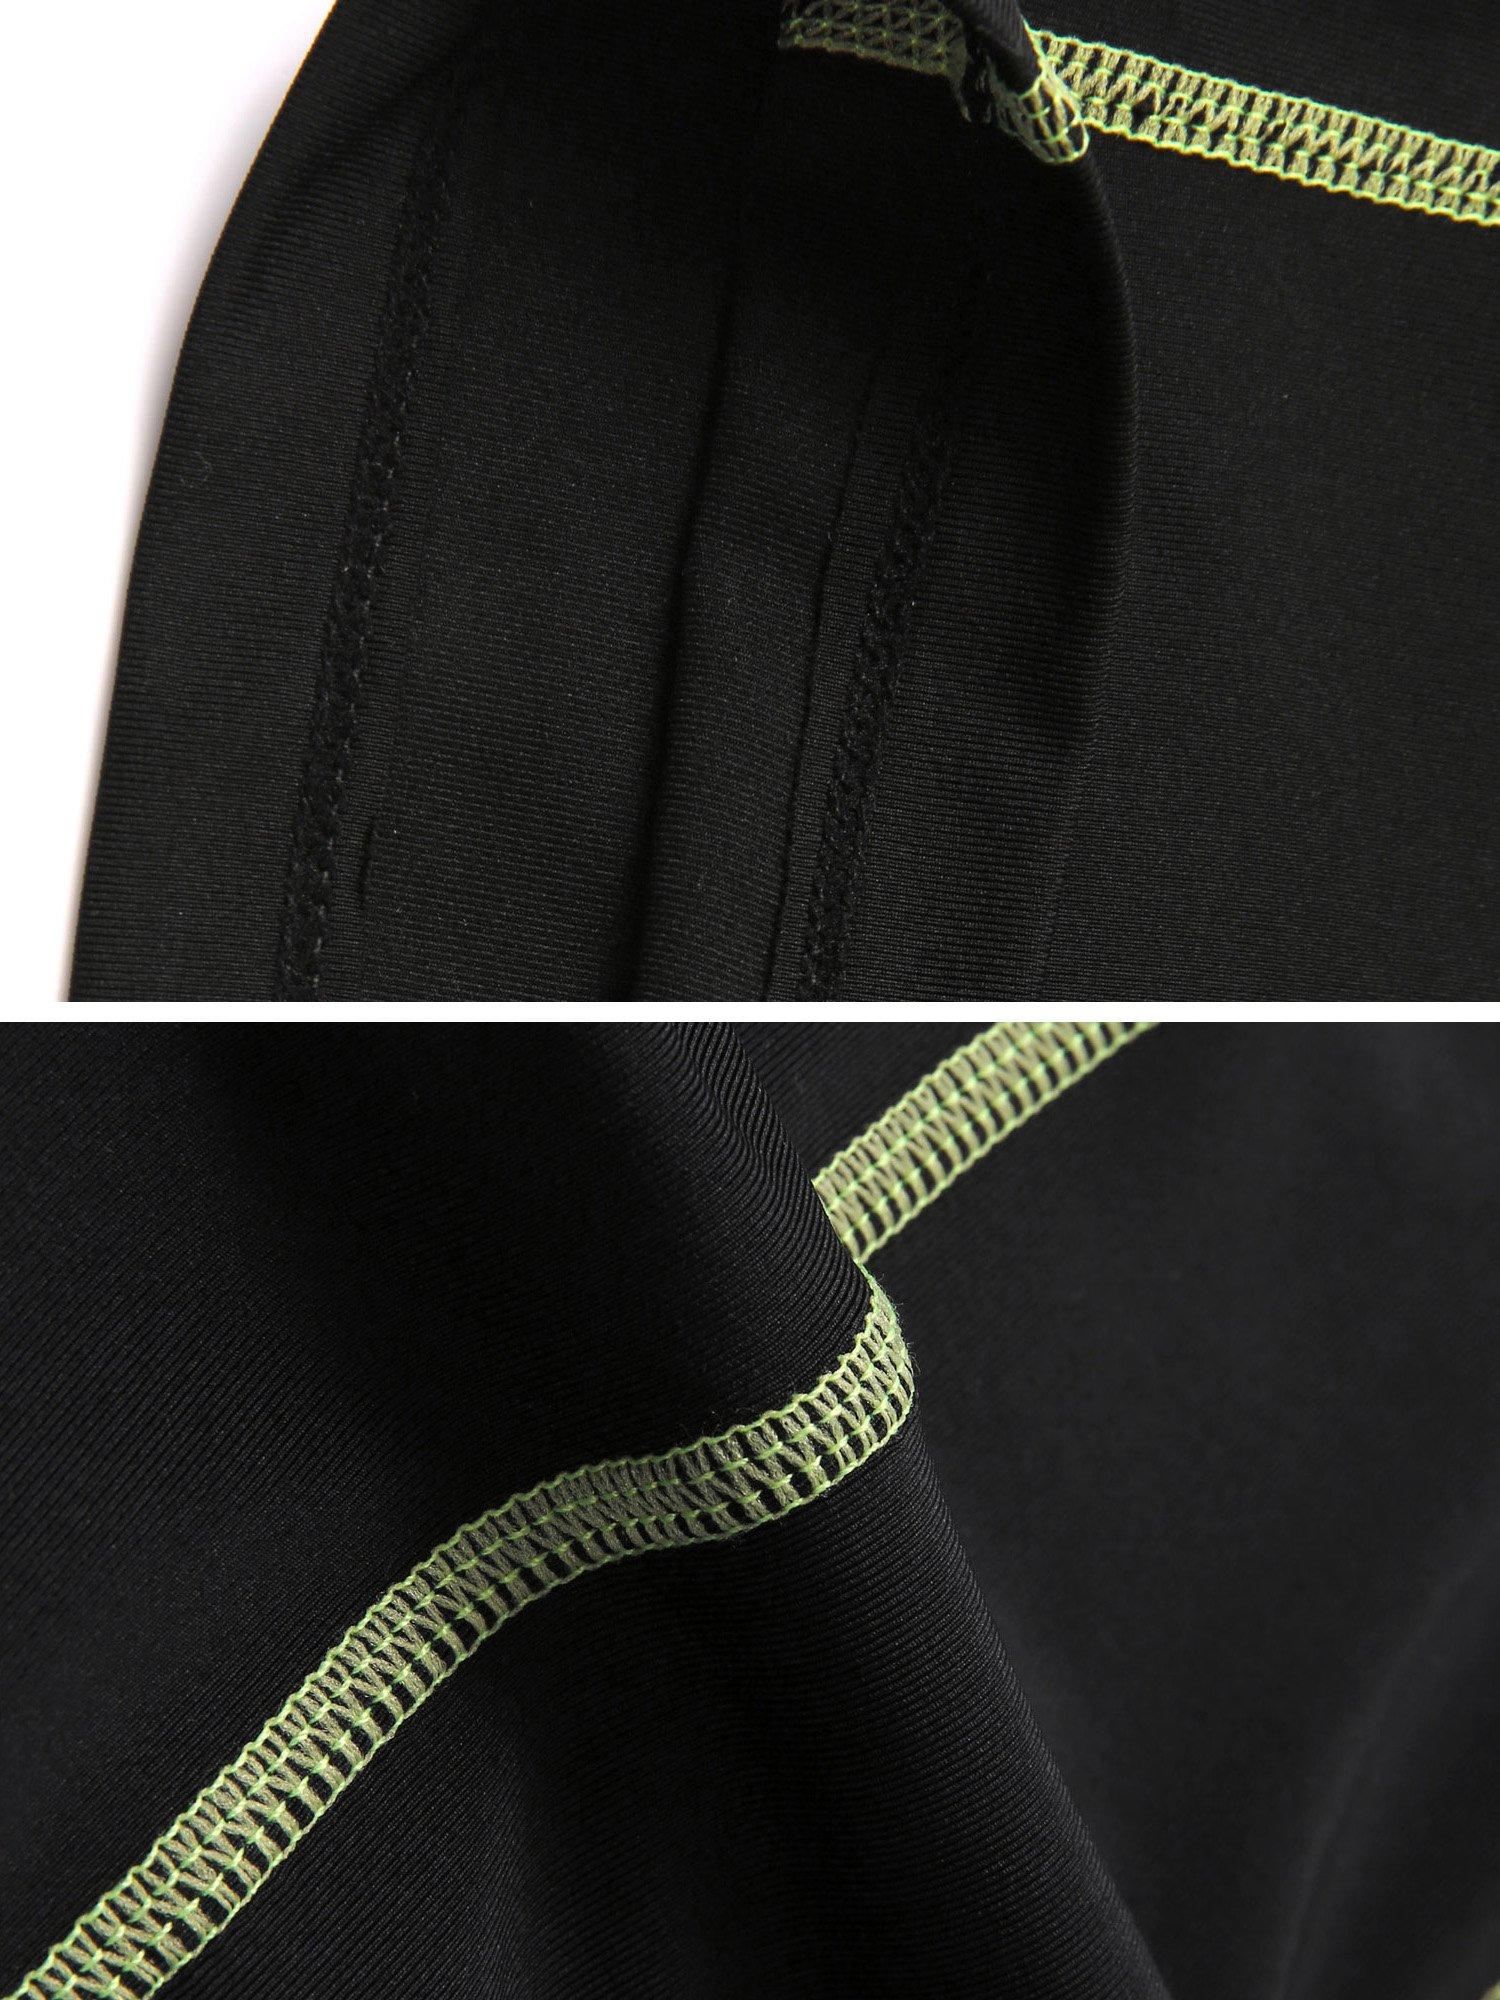 Neleus Men's 3 Pack Compression Short,047,Black,US S,EU M by Neleus (Image #7)